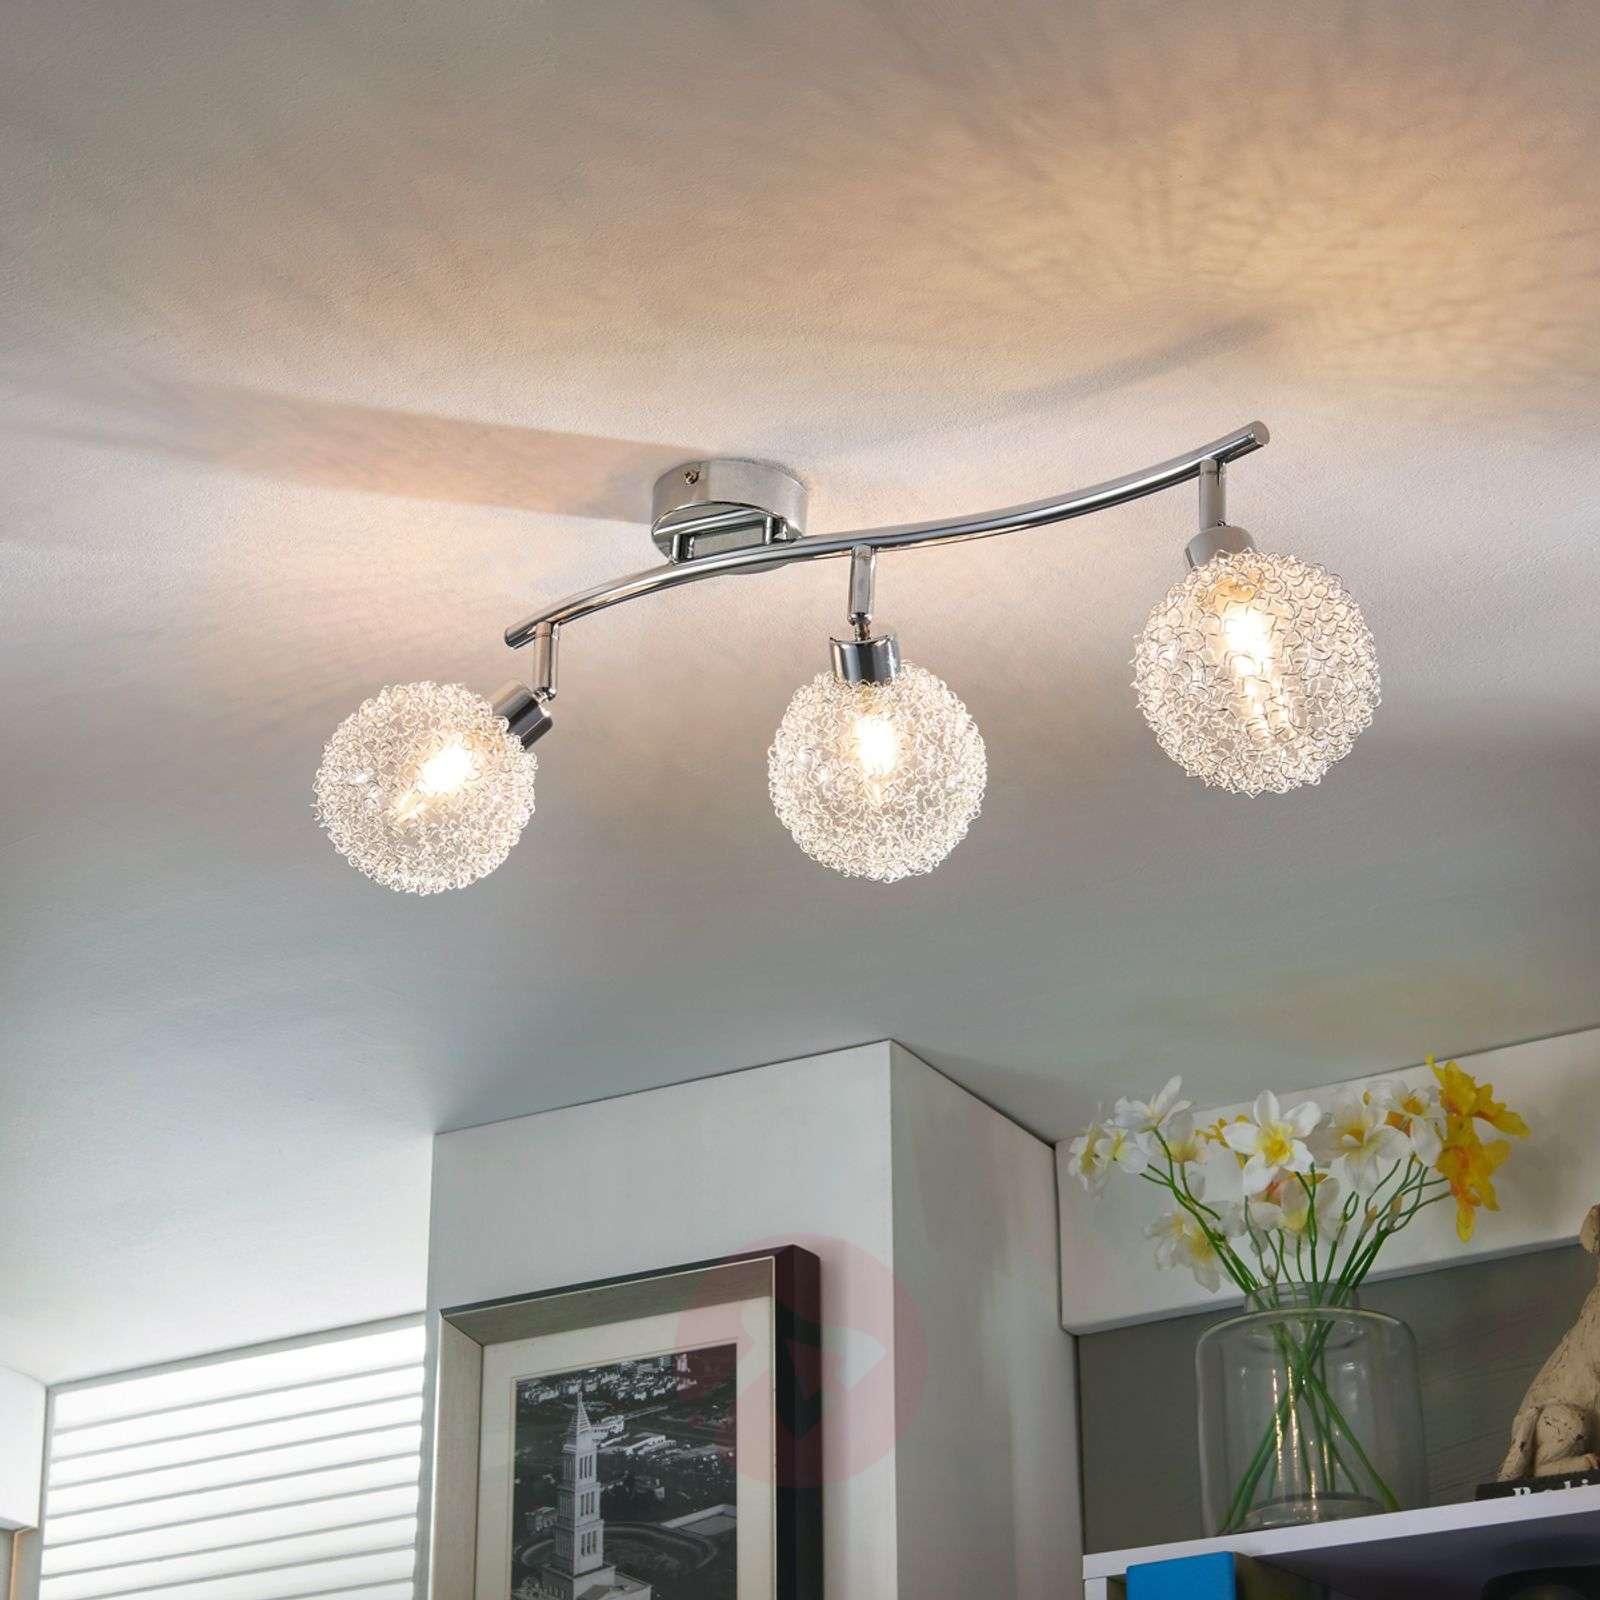 3-bulb LED ceiling light Ticino-9620779-04